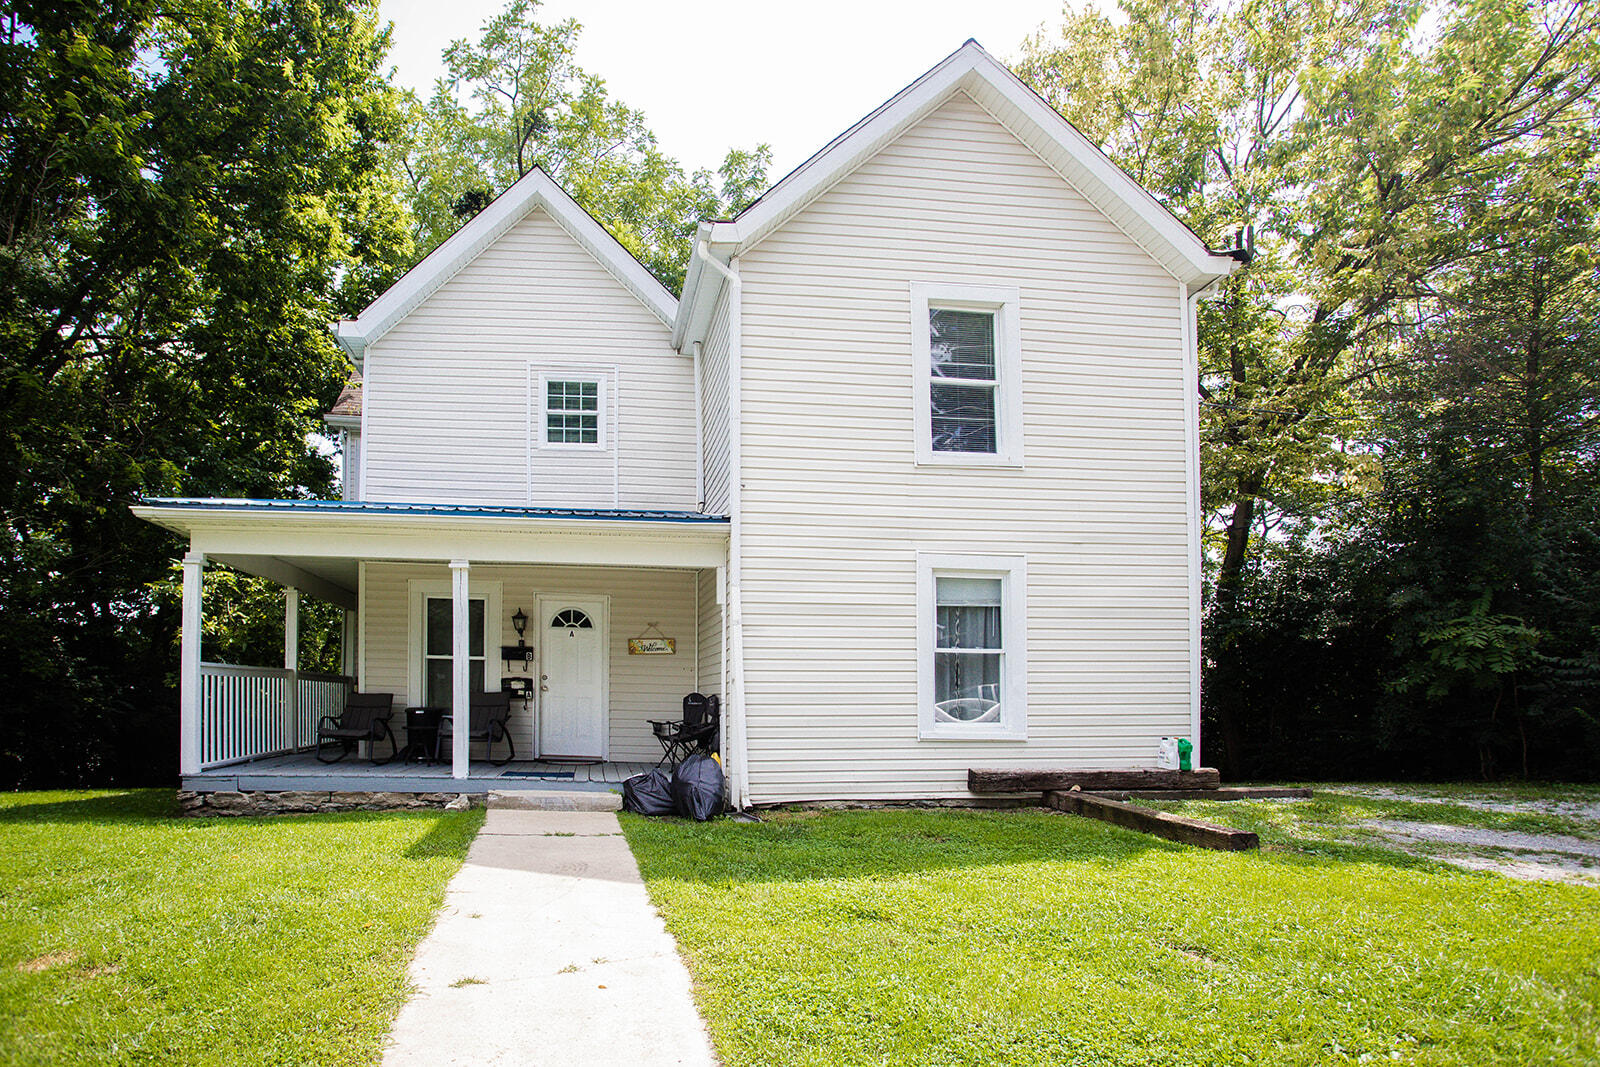 310 High Street, Mt Sterling, Kentucky 40353, 4 Bedrooms Bedrooms, ,2 BathroomsBathrooms,Multi-housing,For Sale,High,20119560